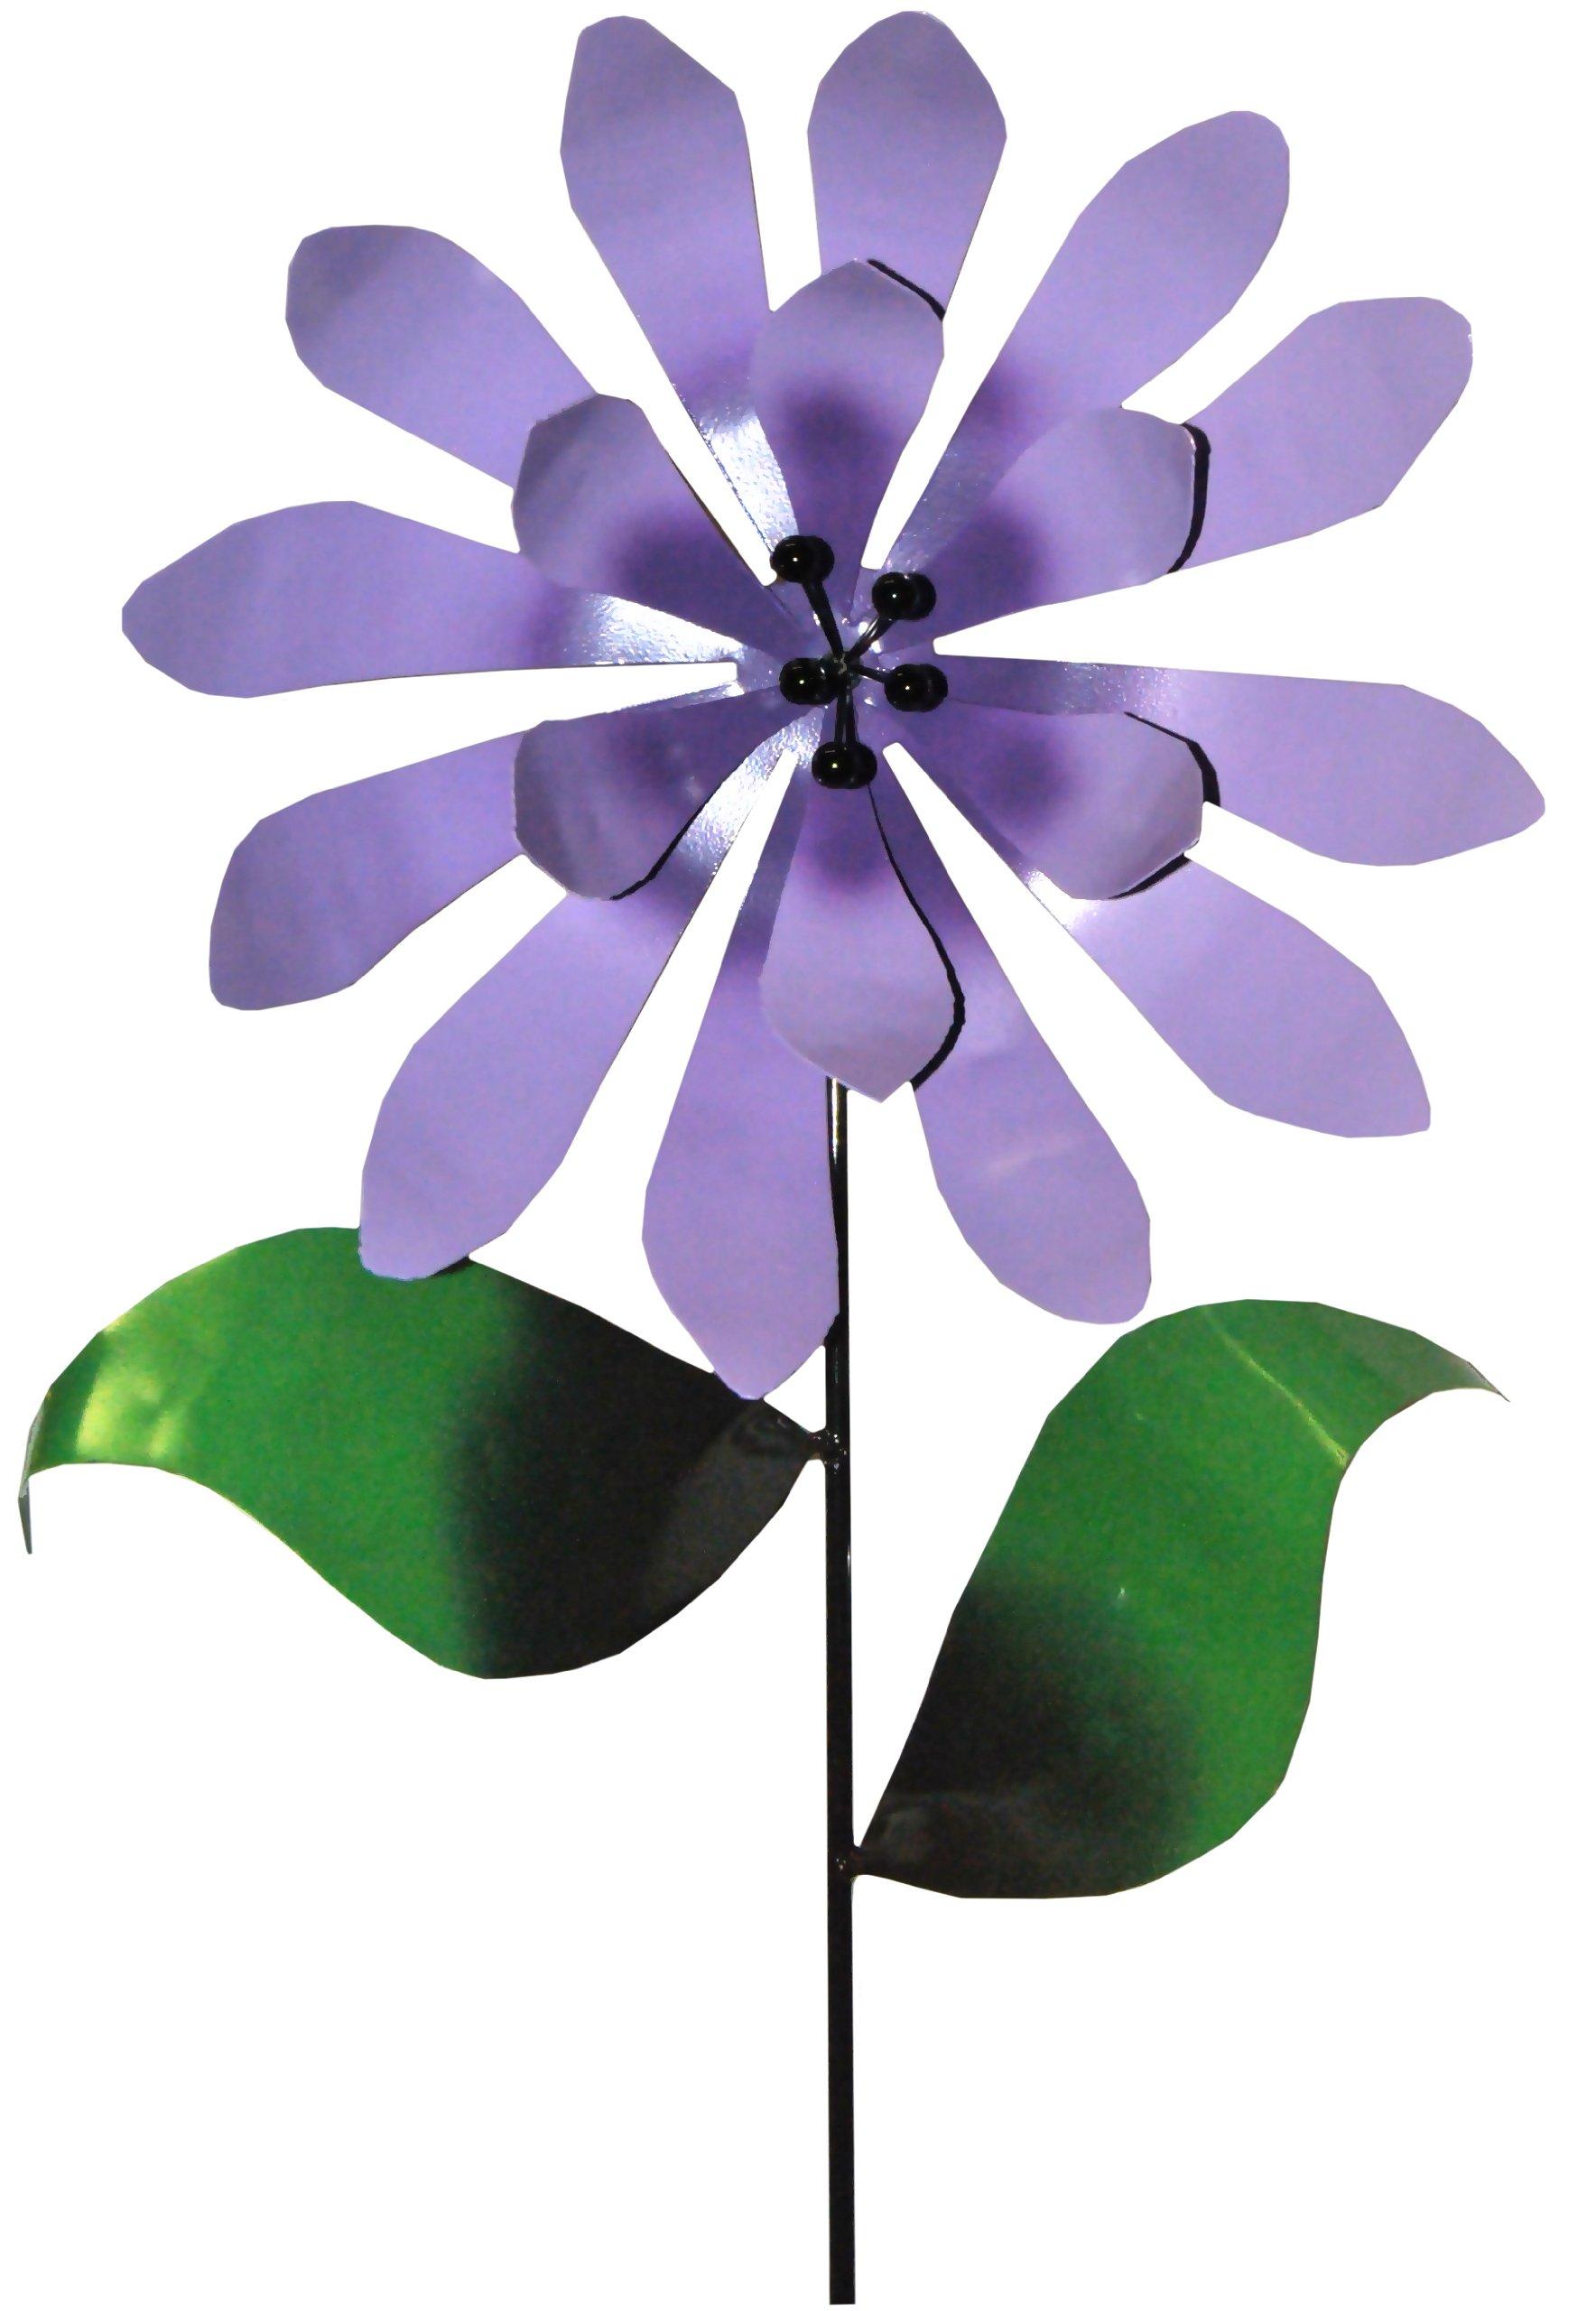 Steven Cooper Metalsmith AFLWR-08-XL Artificial Garden Flower on Footed Stake, 6-Feet, Lavender